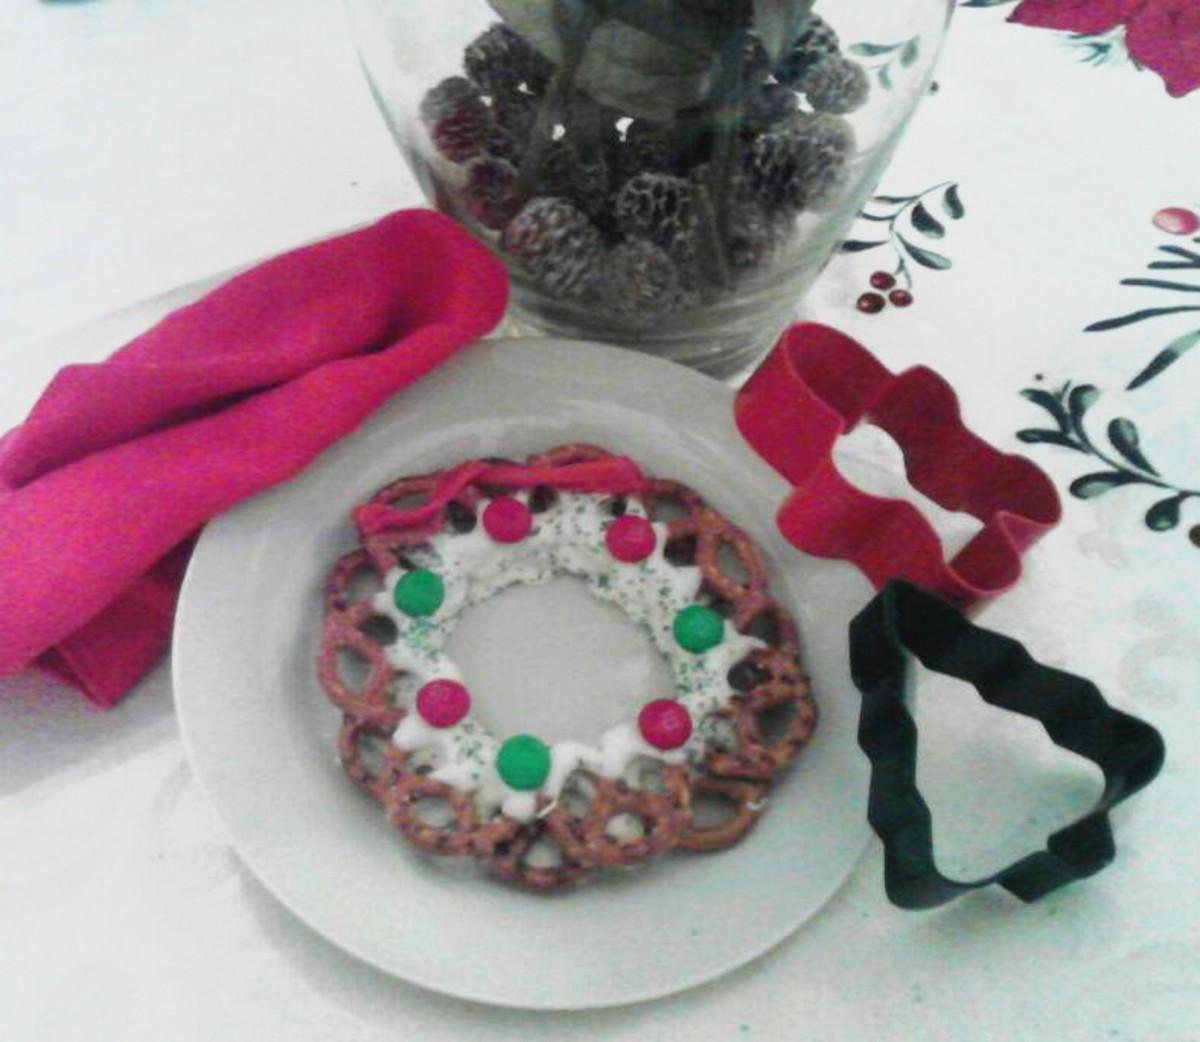 making-an-easy-edible-pretzel-wreath